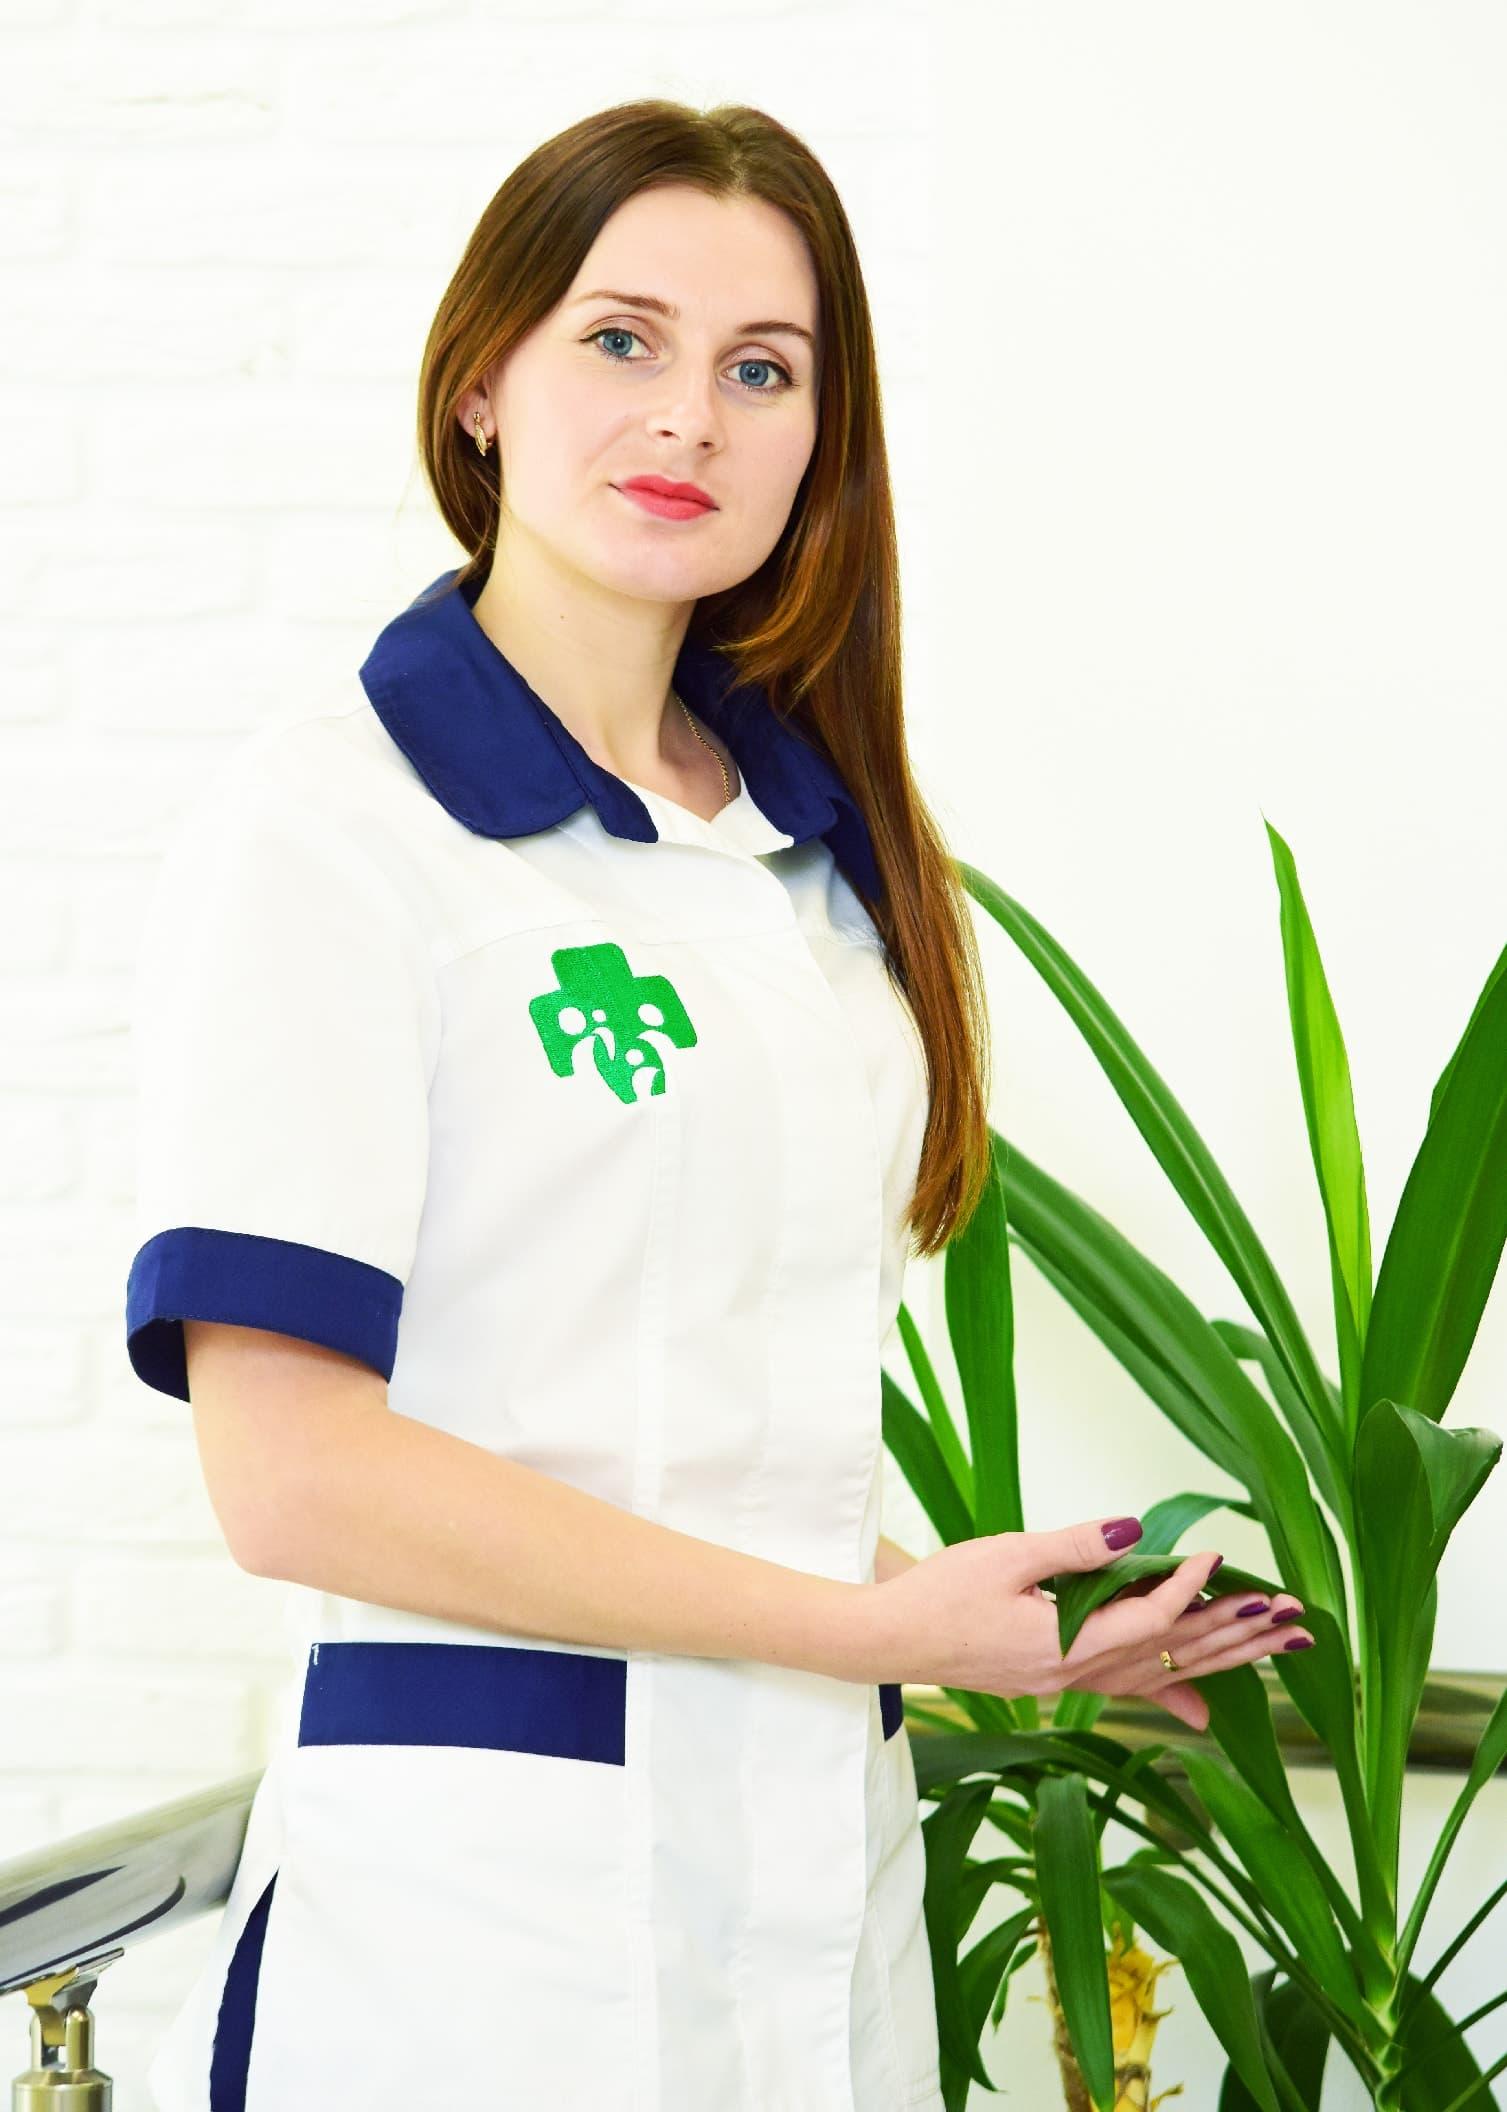 Лях Татьяна Викторовна - семейный врач